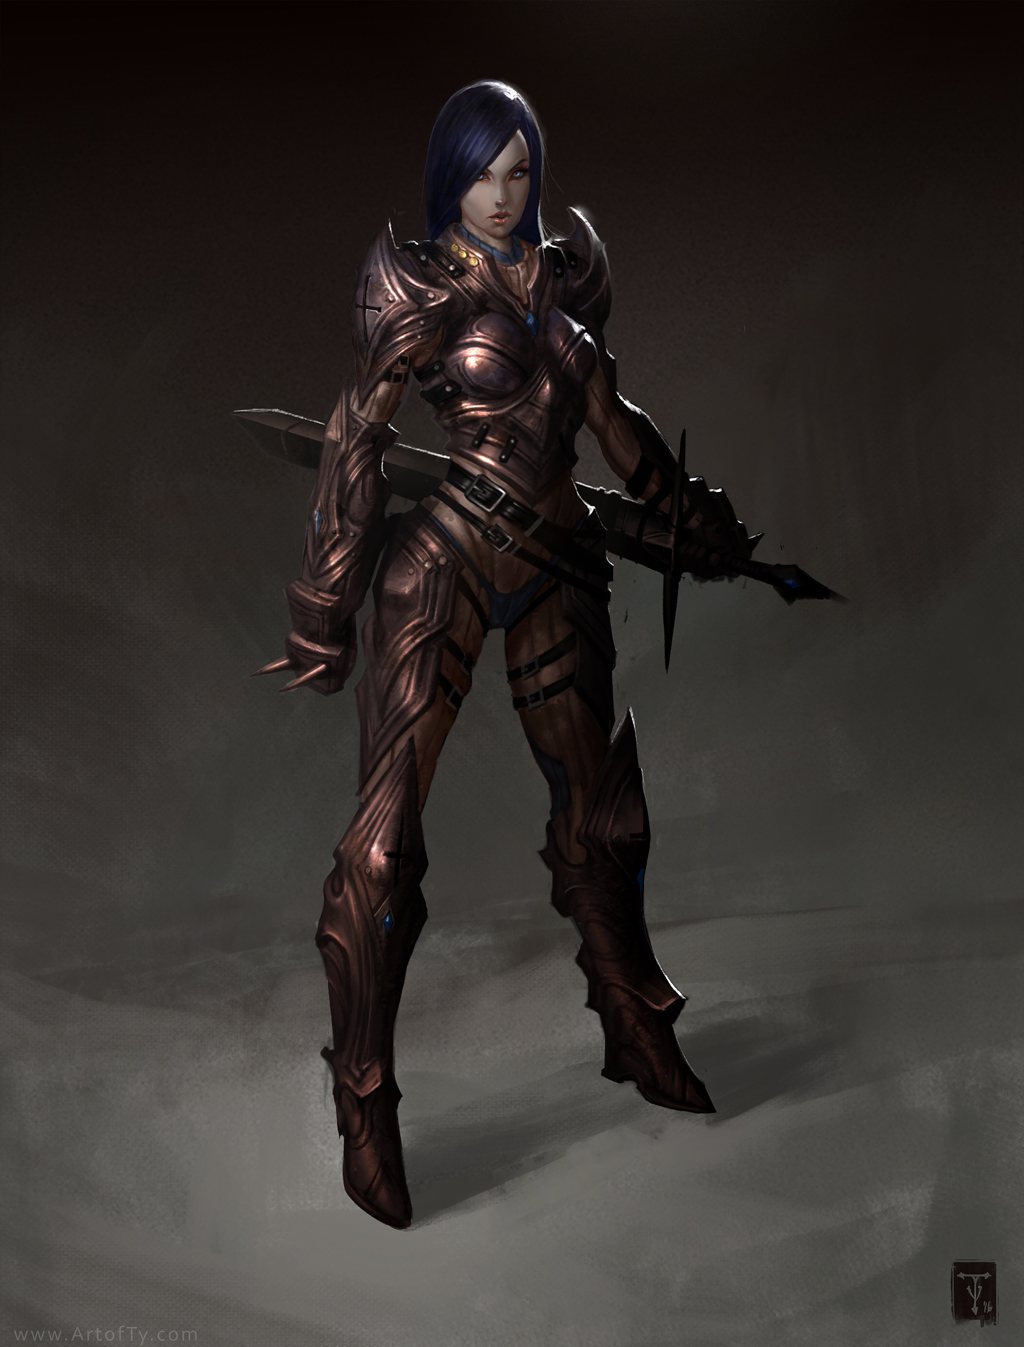 Crusader Jeniva by ArtofTy